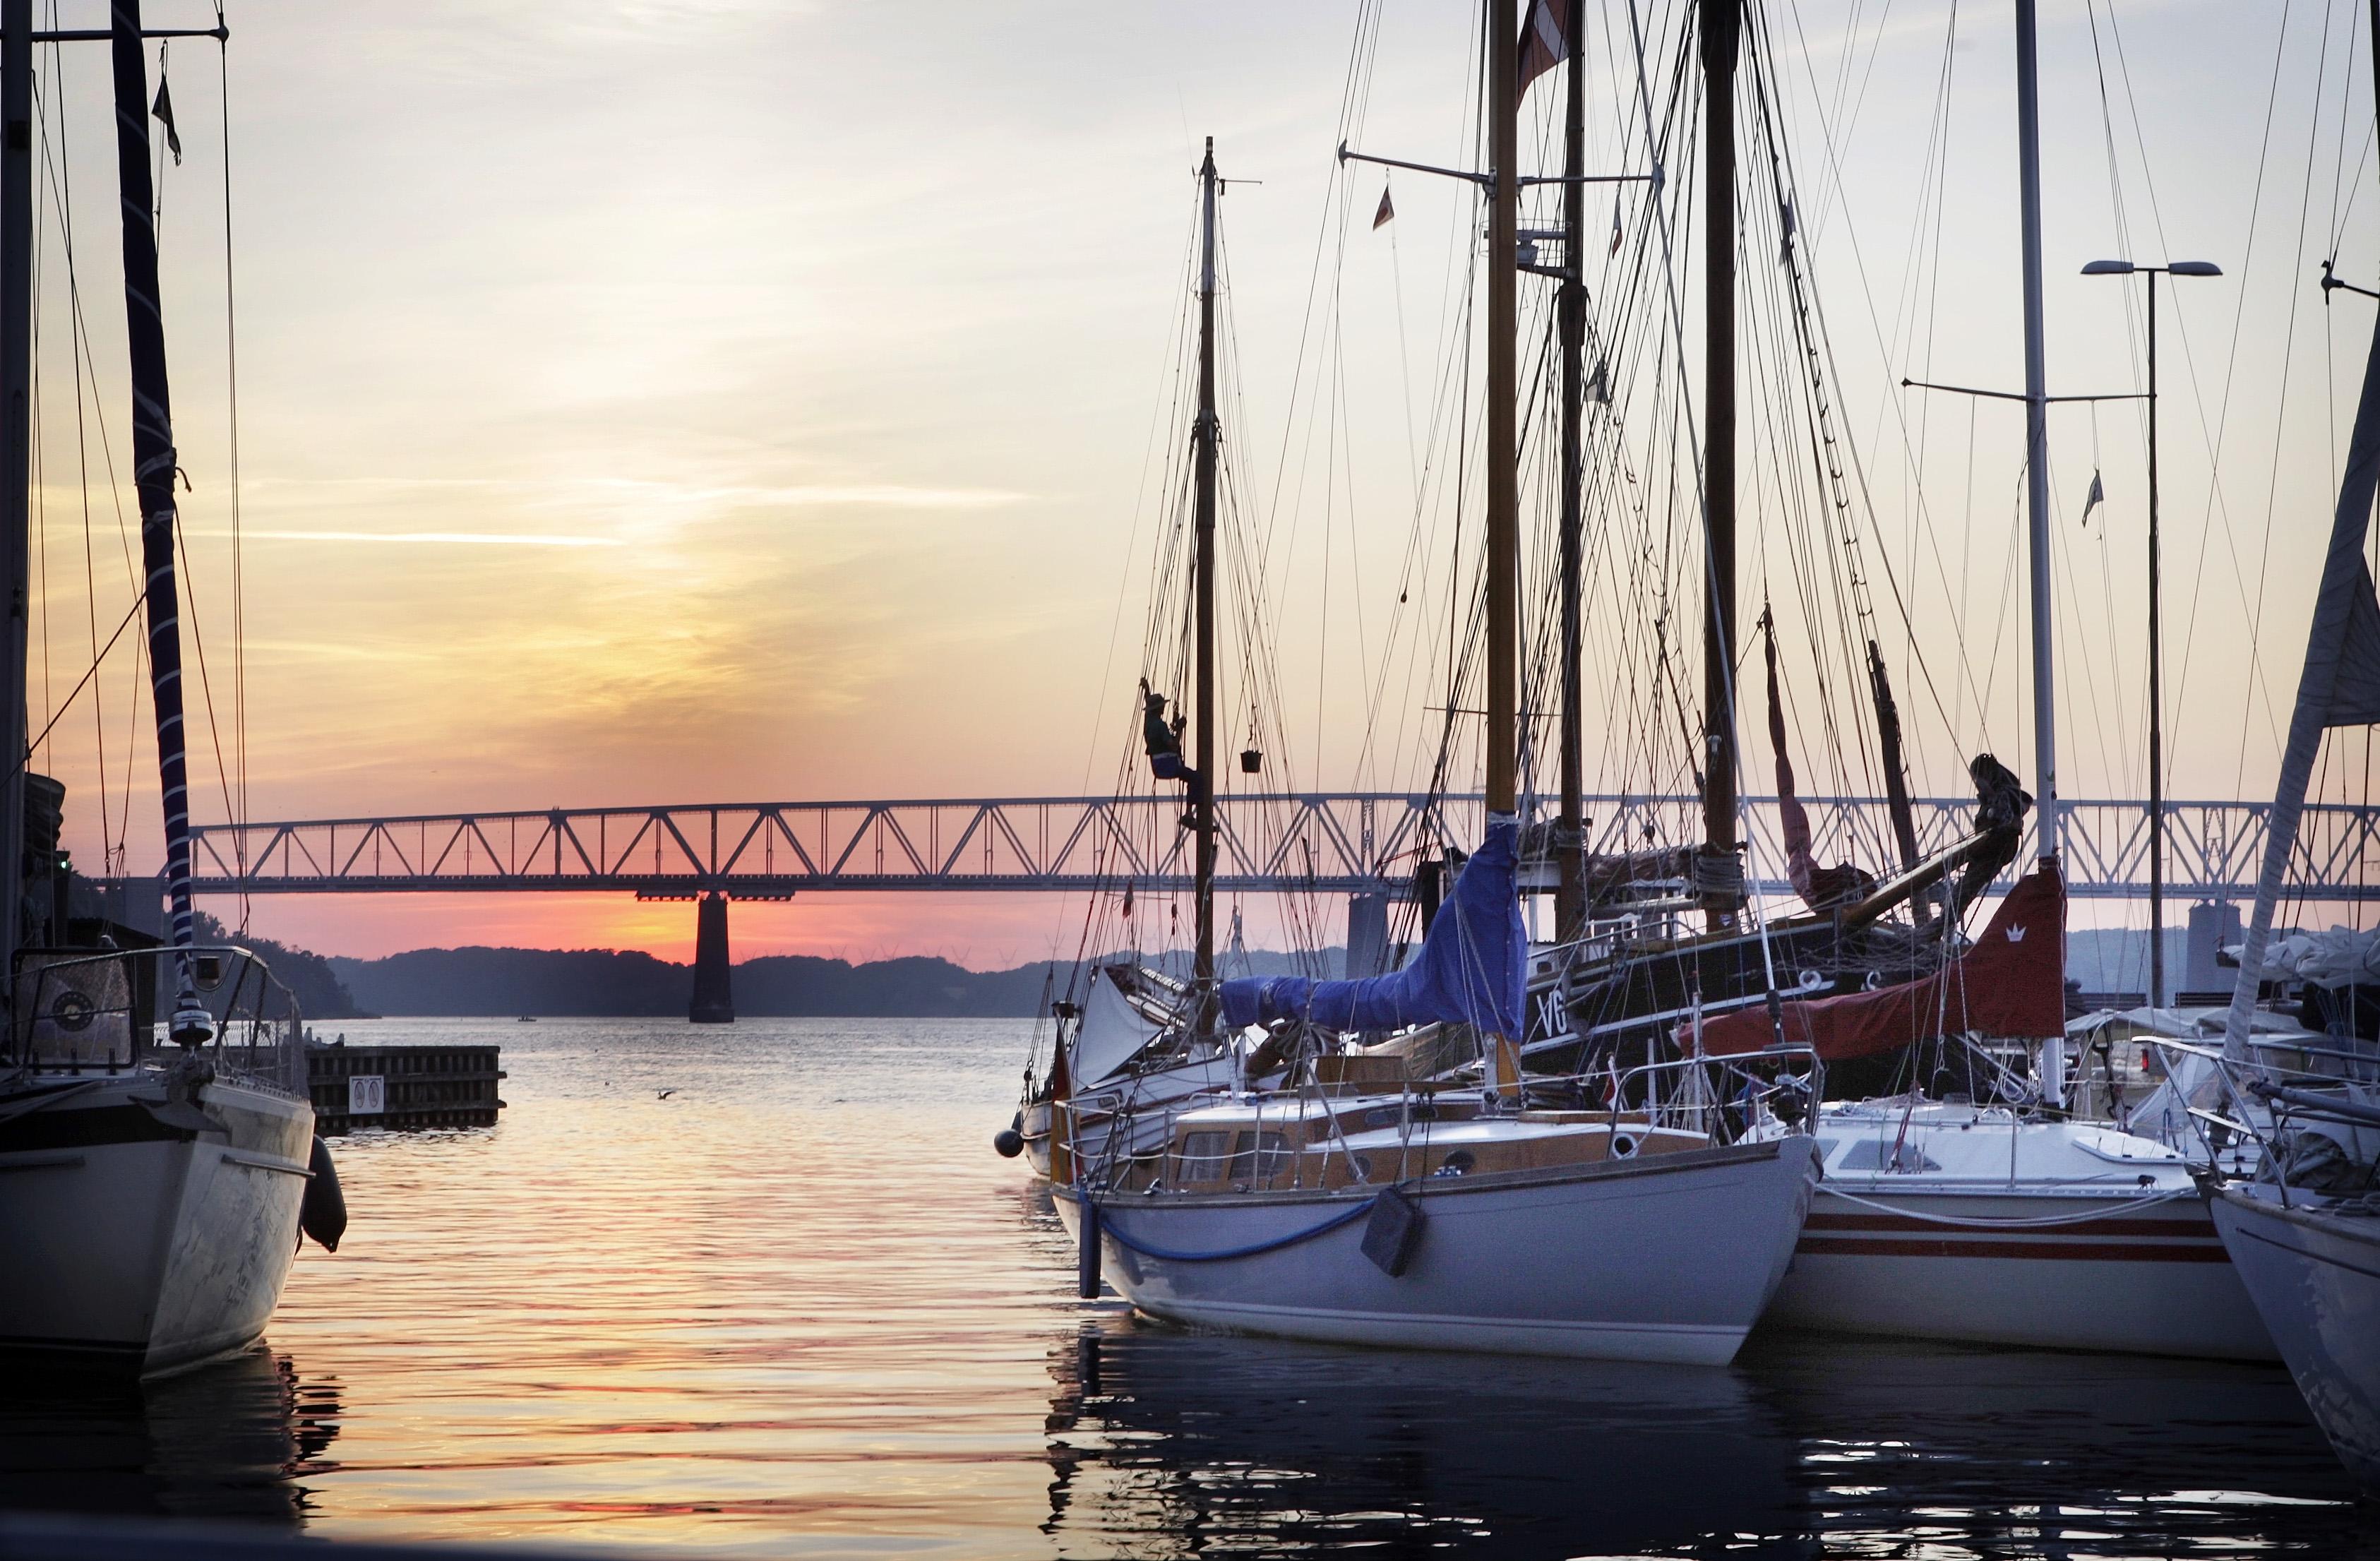 Juelsminde (Mola Yachting)